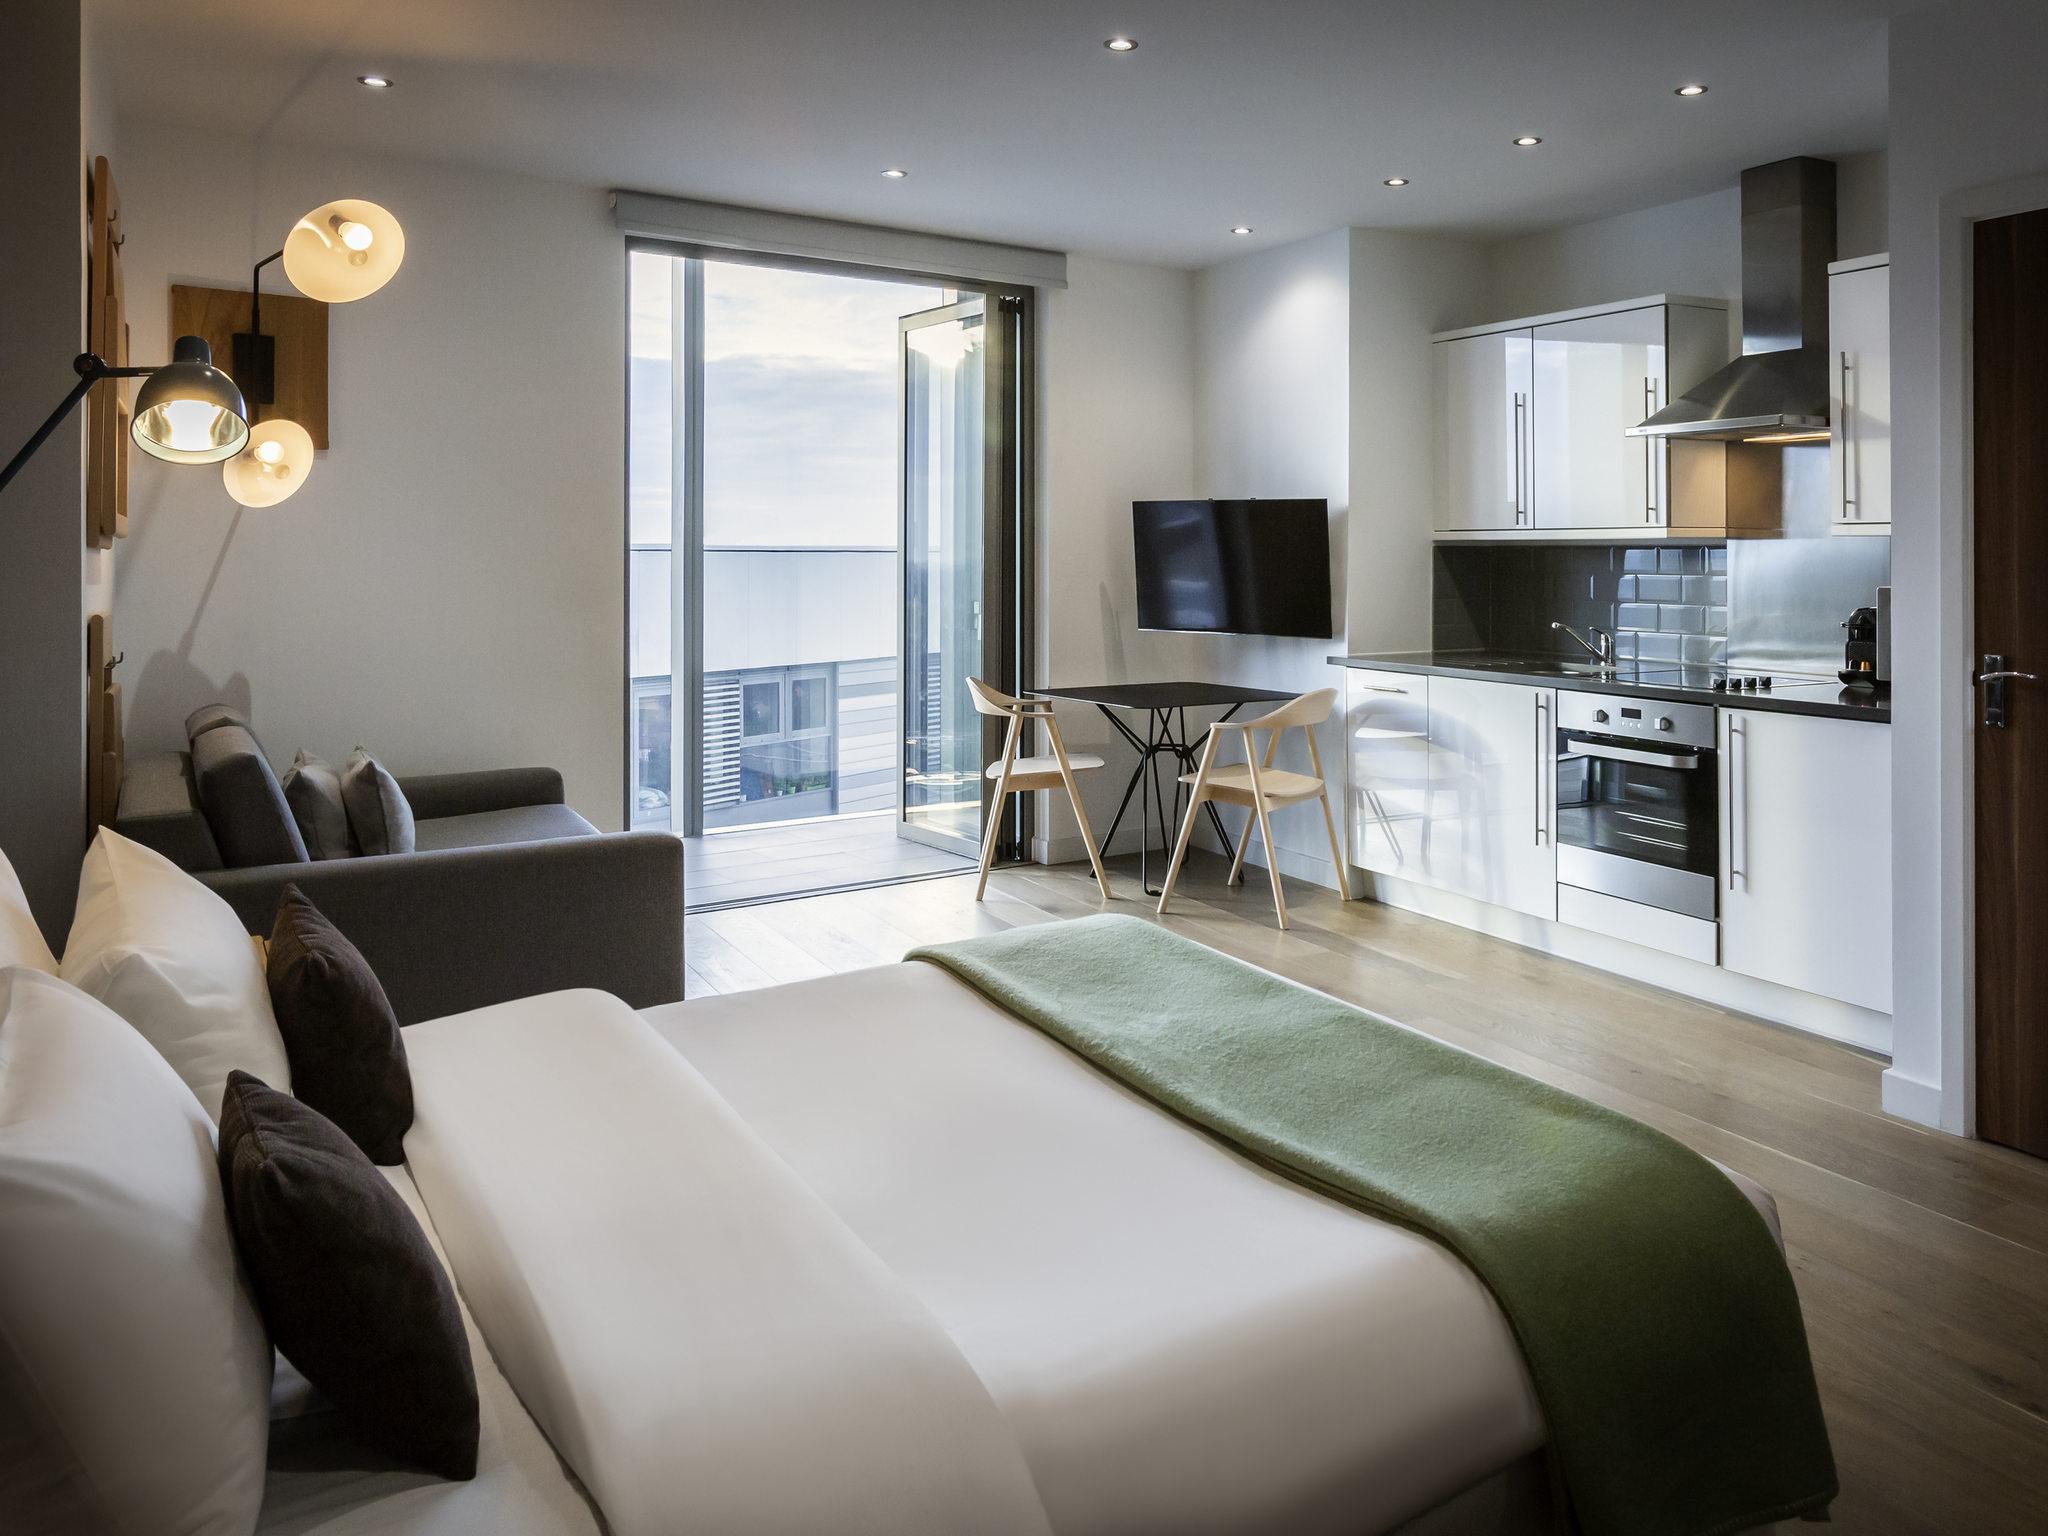 Hotell – Aparthotel Adagio London Brentford (öppnar i oktober 2018)